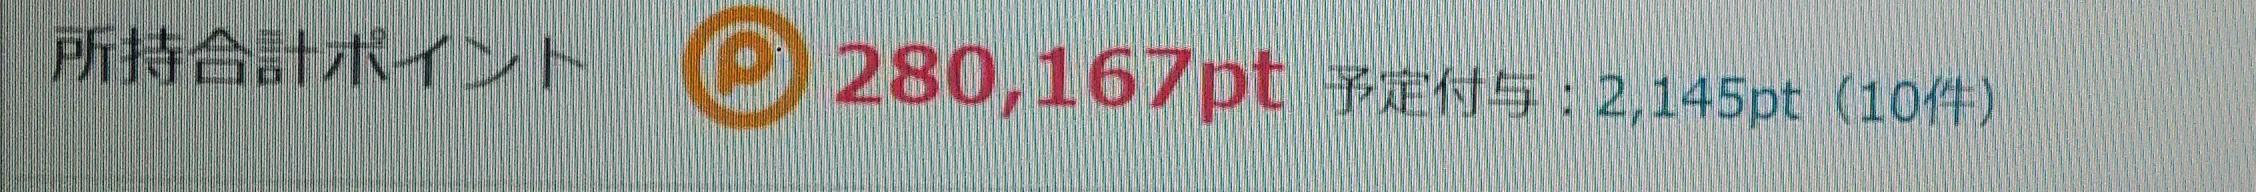 266d956a44544daf5248aaddde87ddaa191d5450a1ff123c86pimgpsh_fullsize_distr